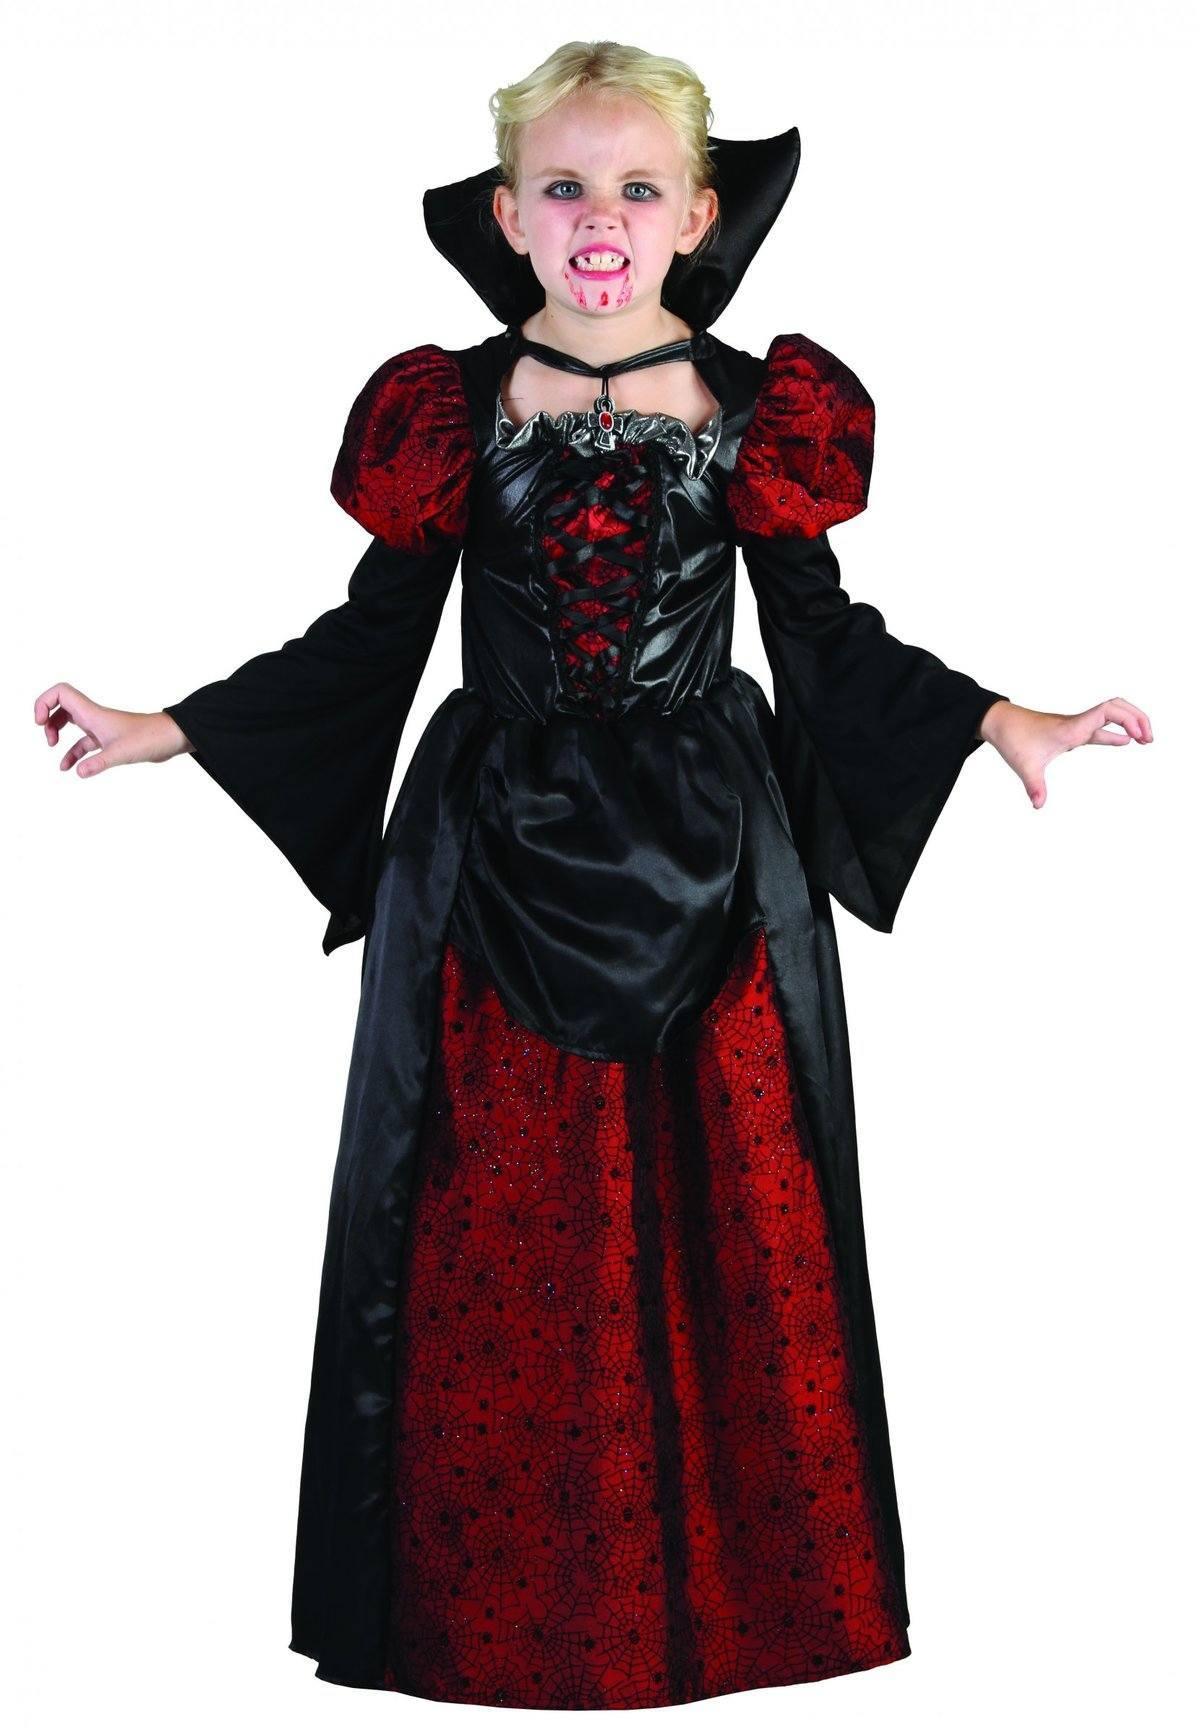 disfraces-para-ninas-halloween-2014-vampiresa